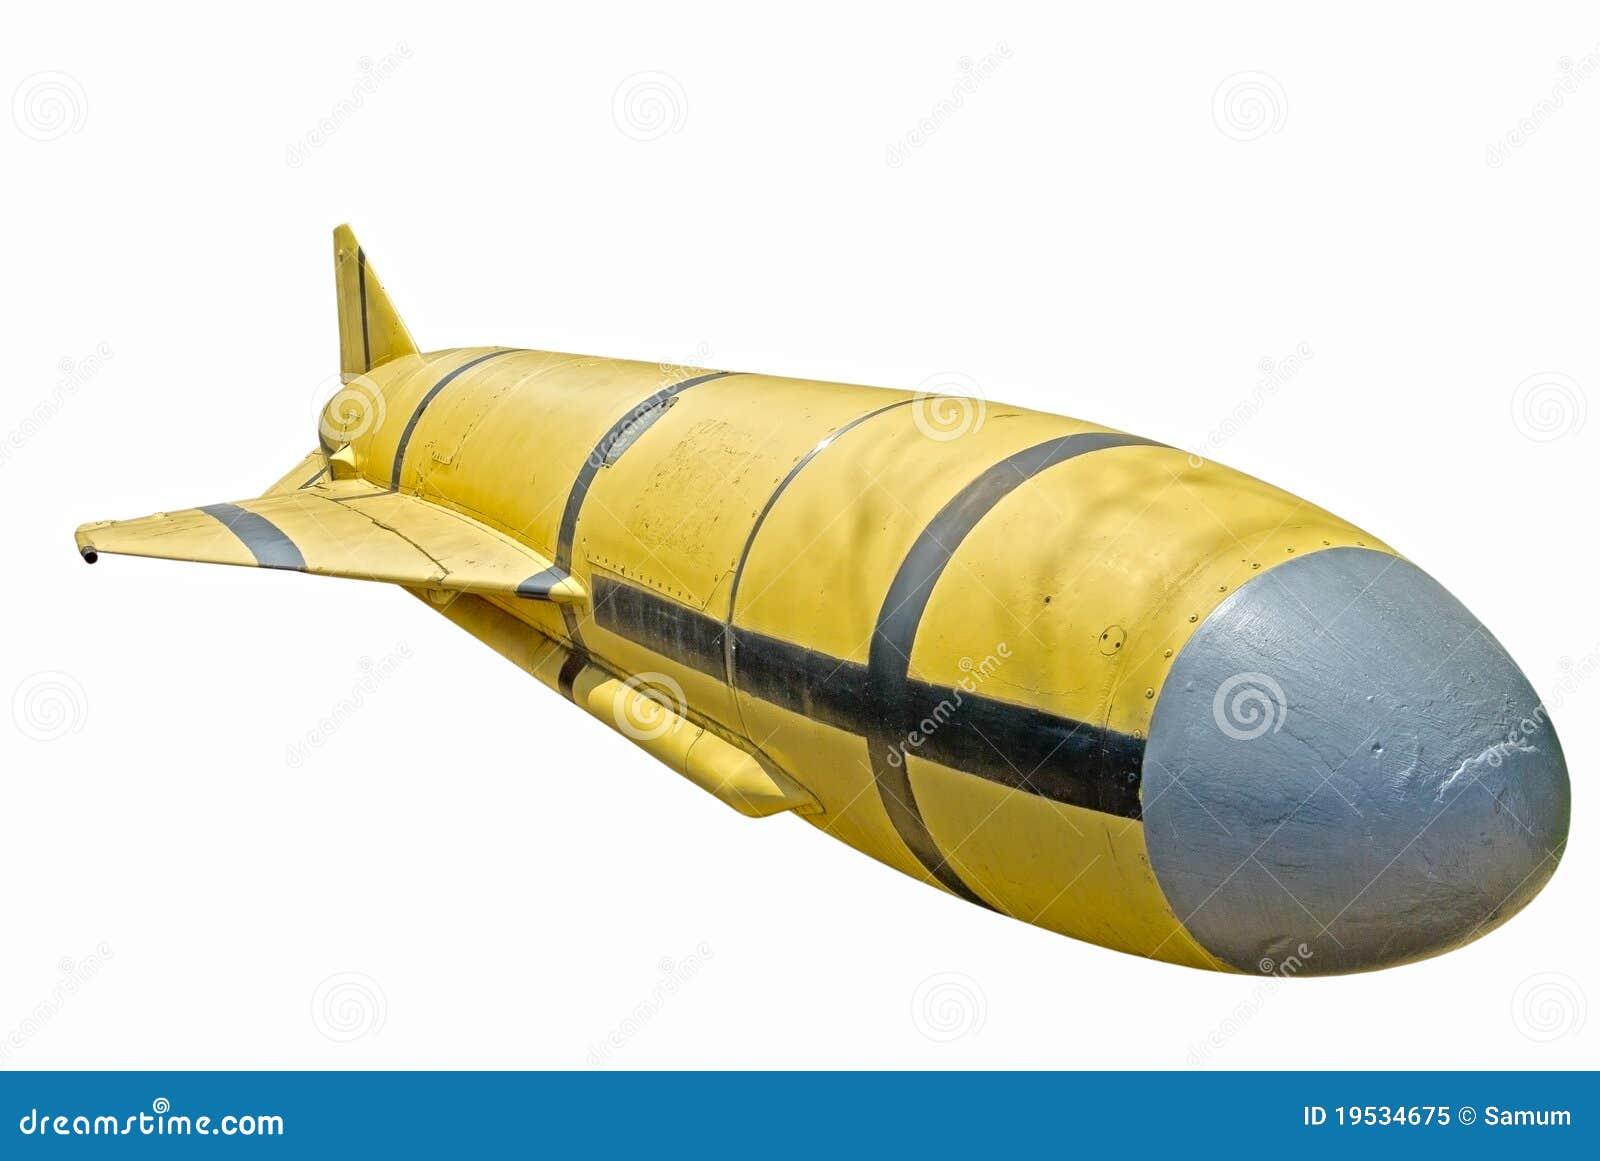 Missile antinavire